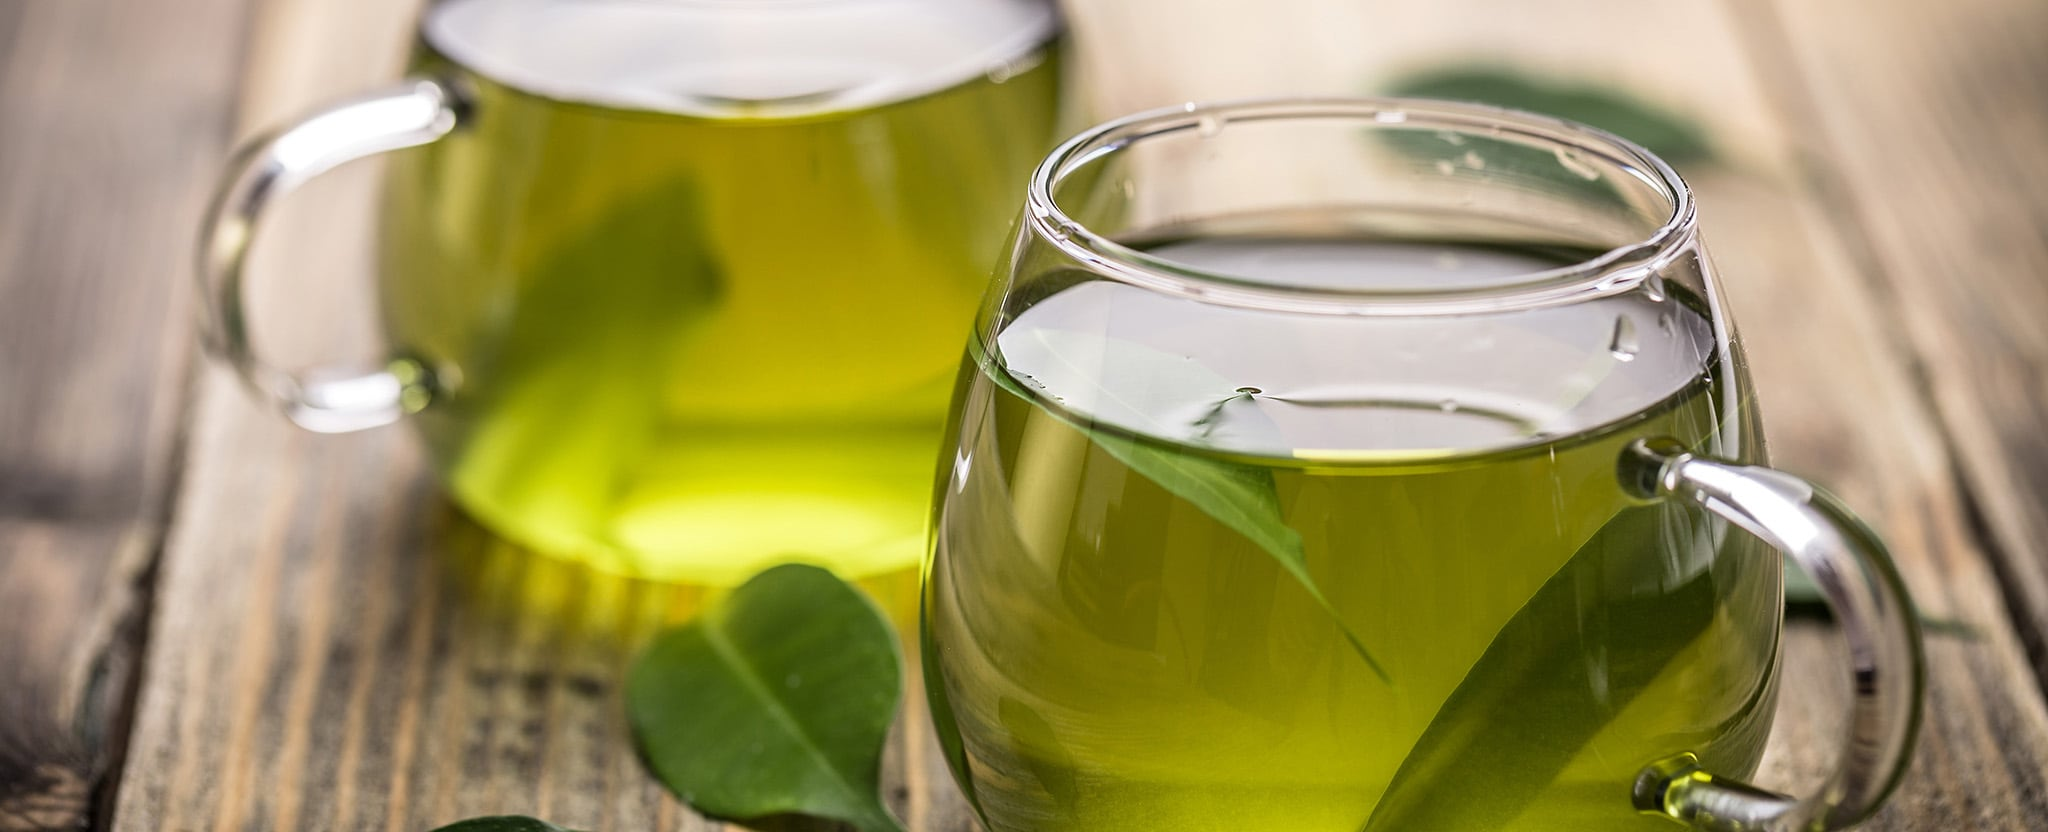 Milk green tea. How to brew tea 52